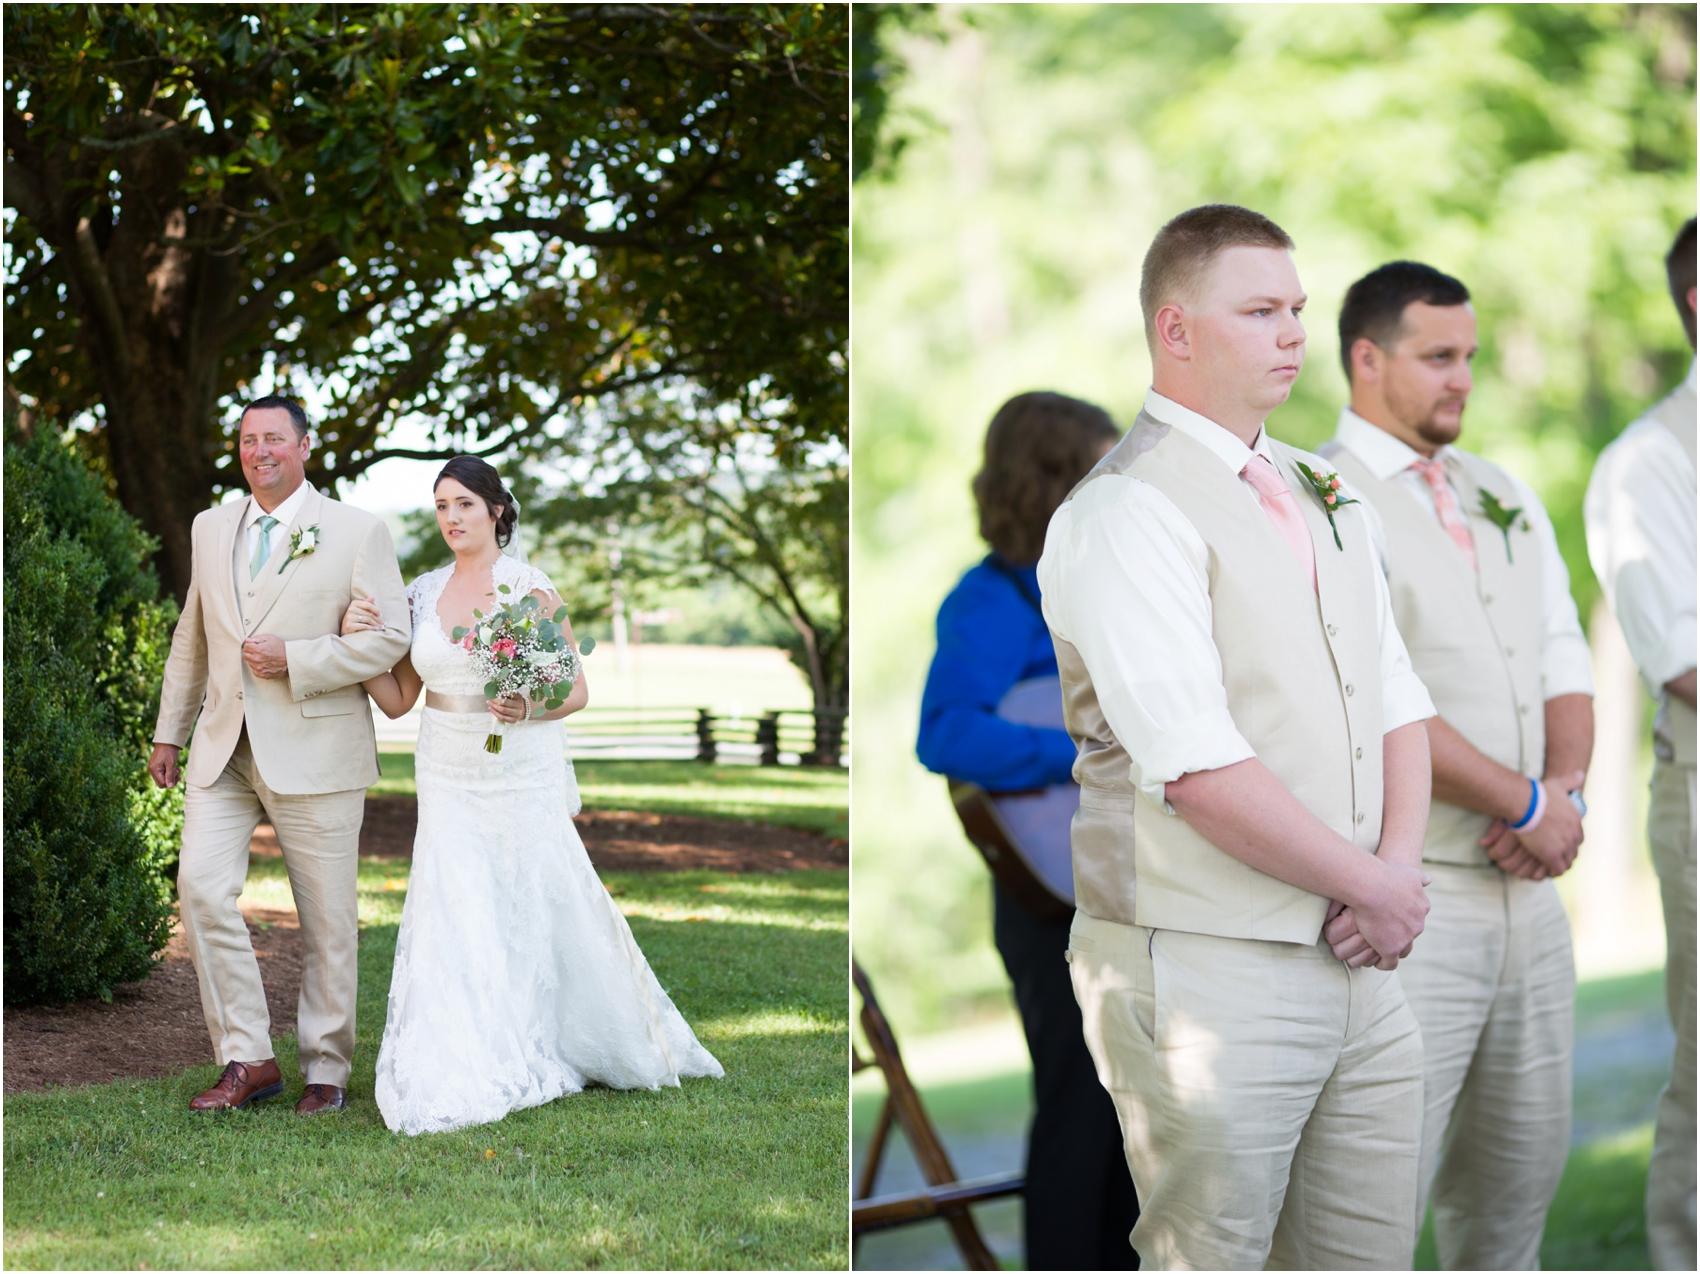 Rodes Farm Charlottesville VA Wedding-7-3.jpg